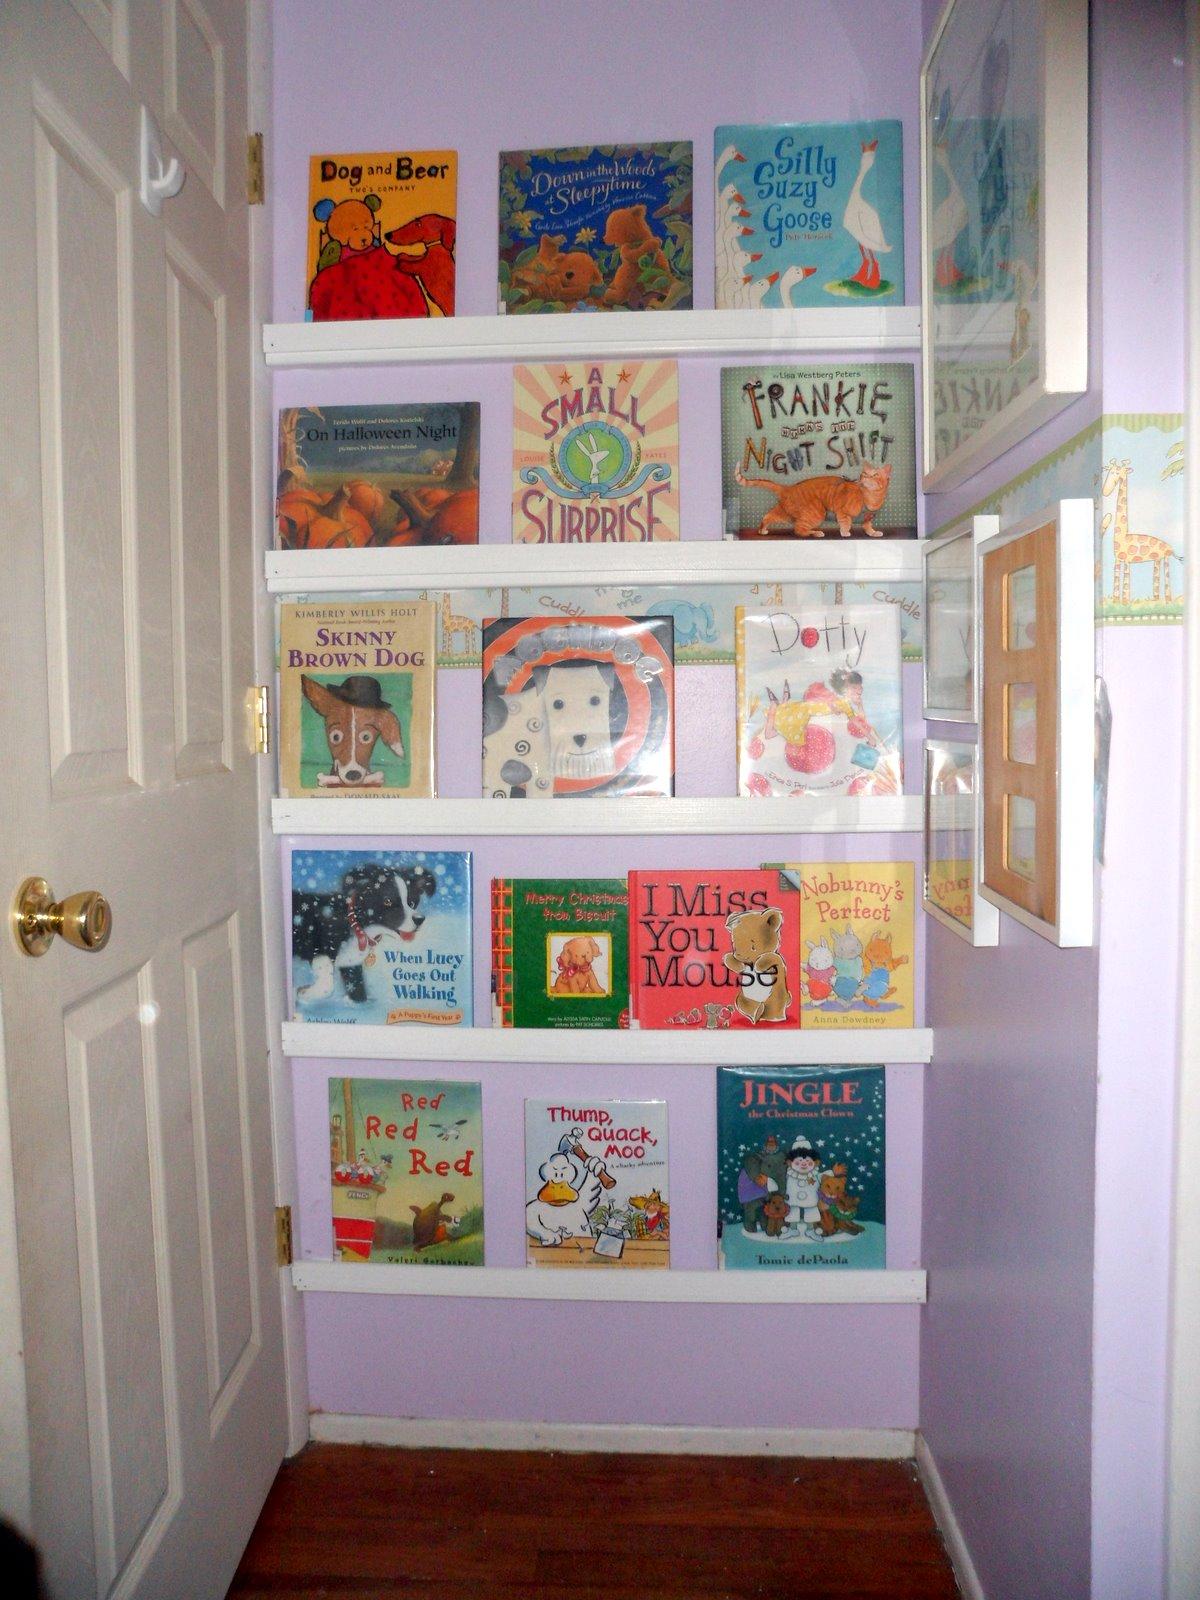 ebook didos daughters literacy gender and